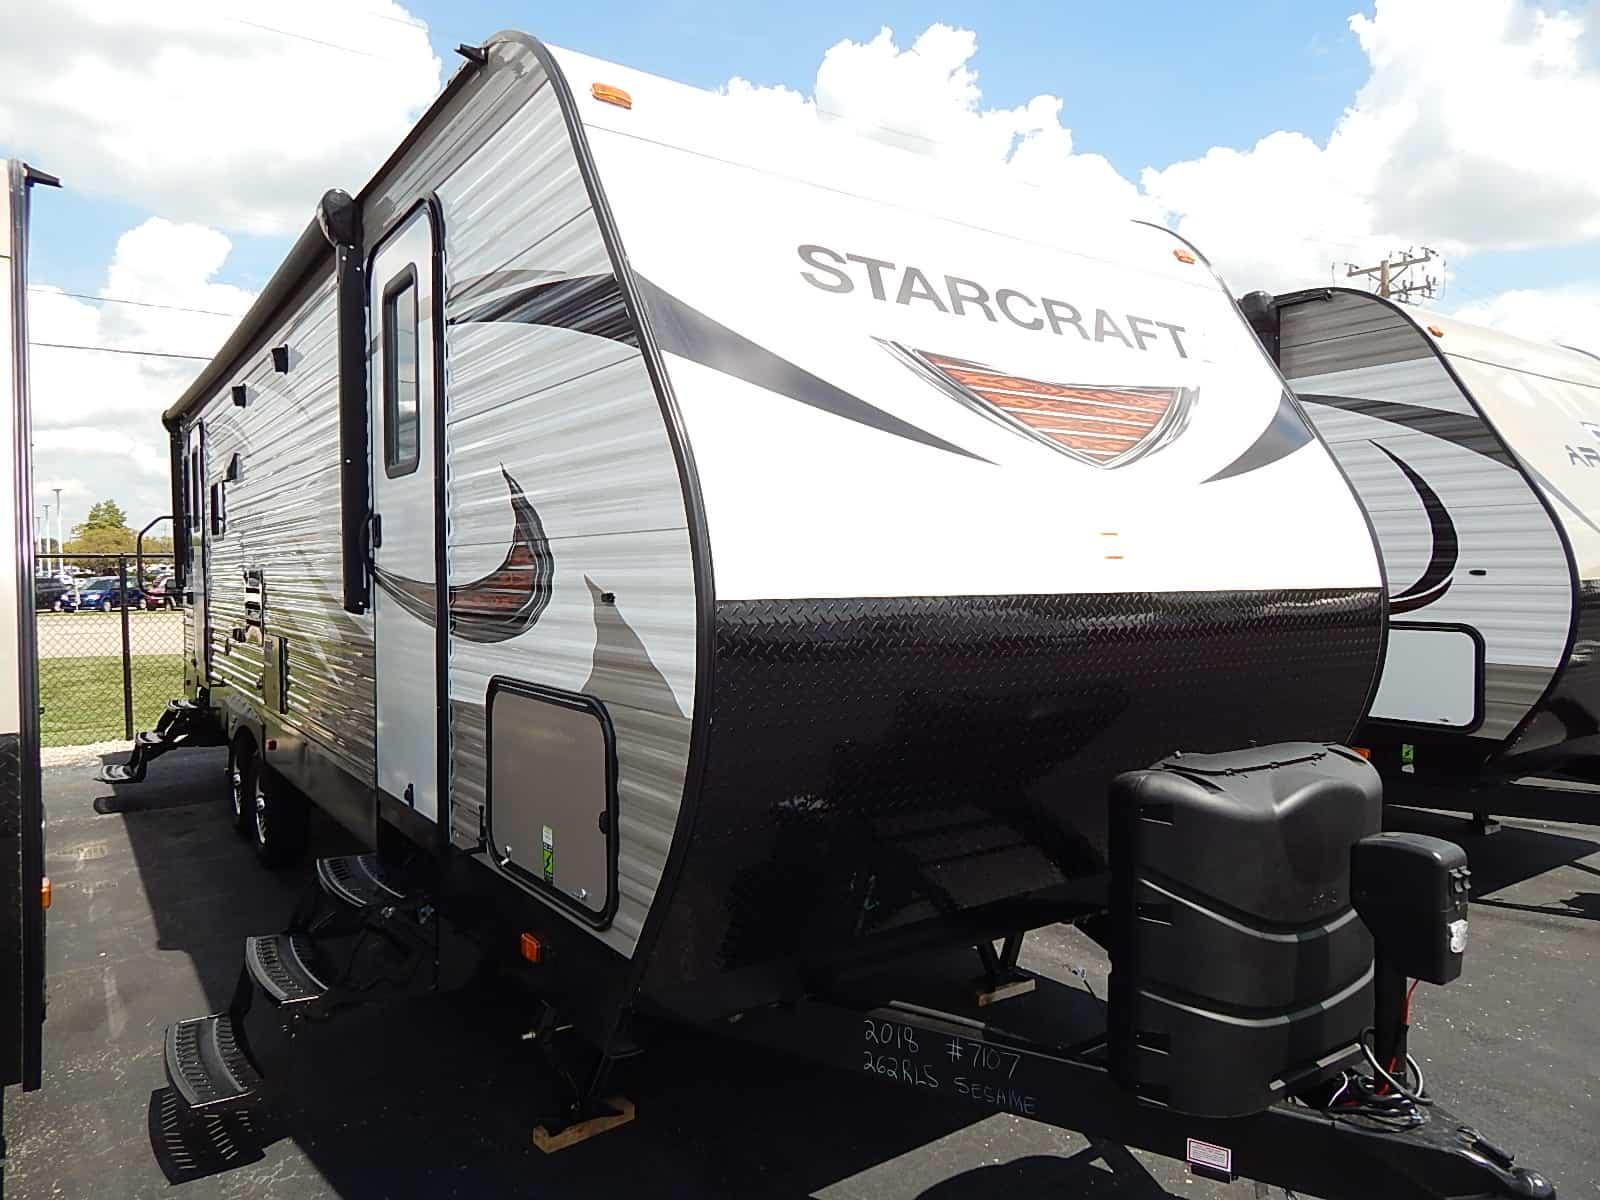 NEW 2018 Starcraft AUTUMN RIDGE 262RLS - Rick's RV Center